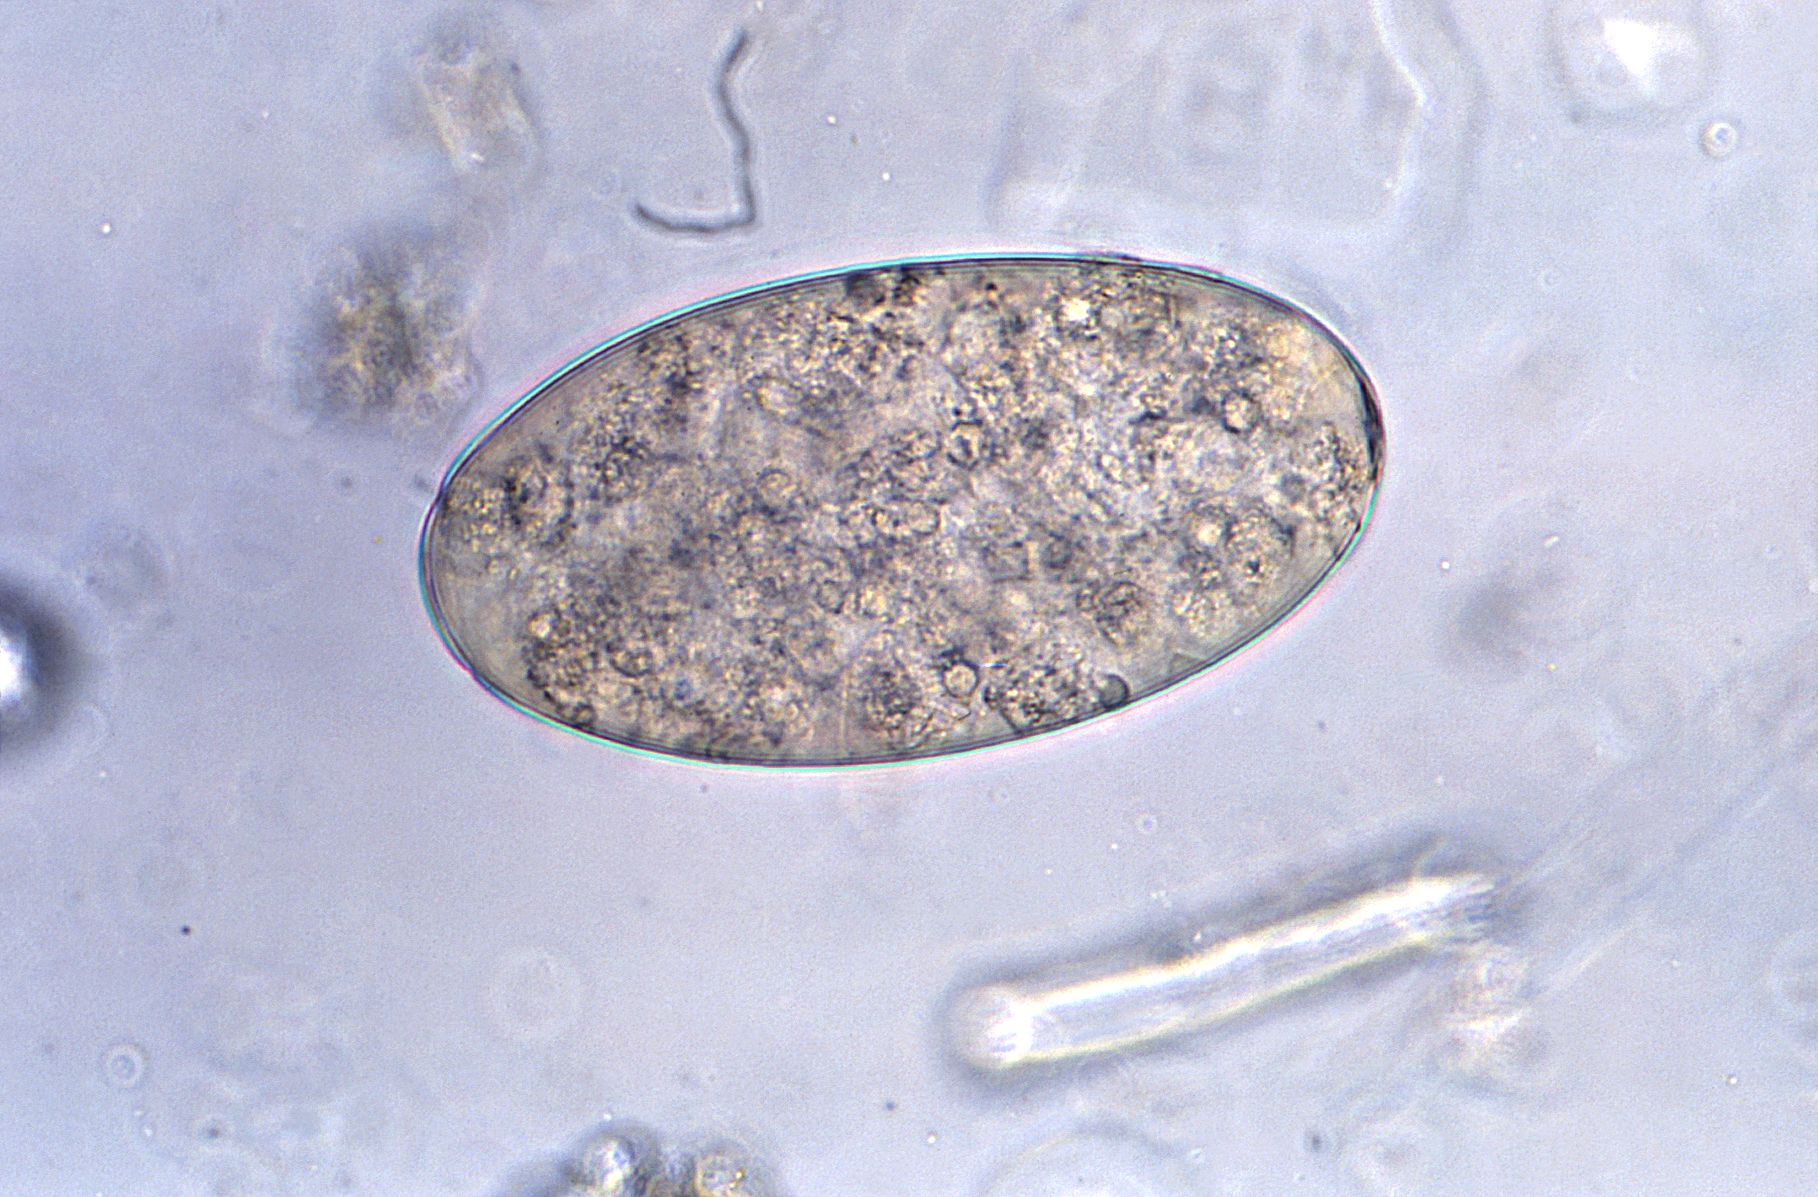 File:Fasciolopsis buski egg 08G0039 lores.jpg - Wikipedia